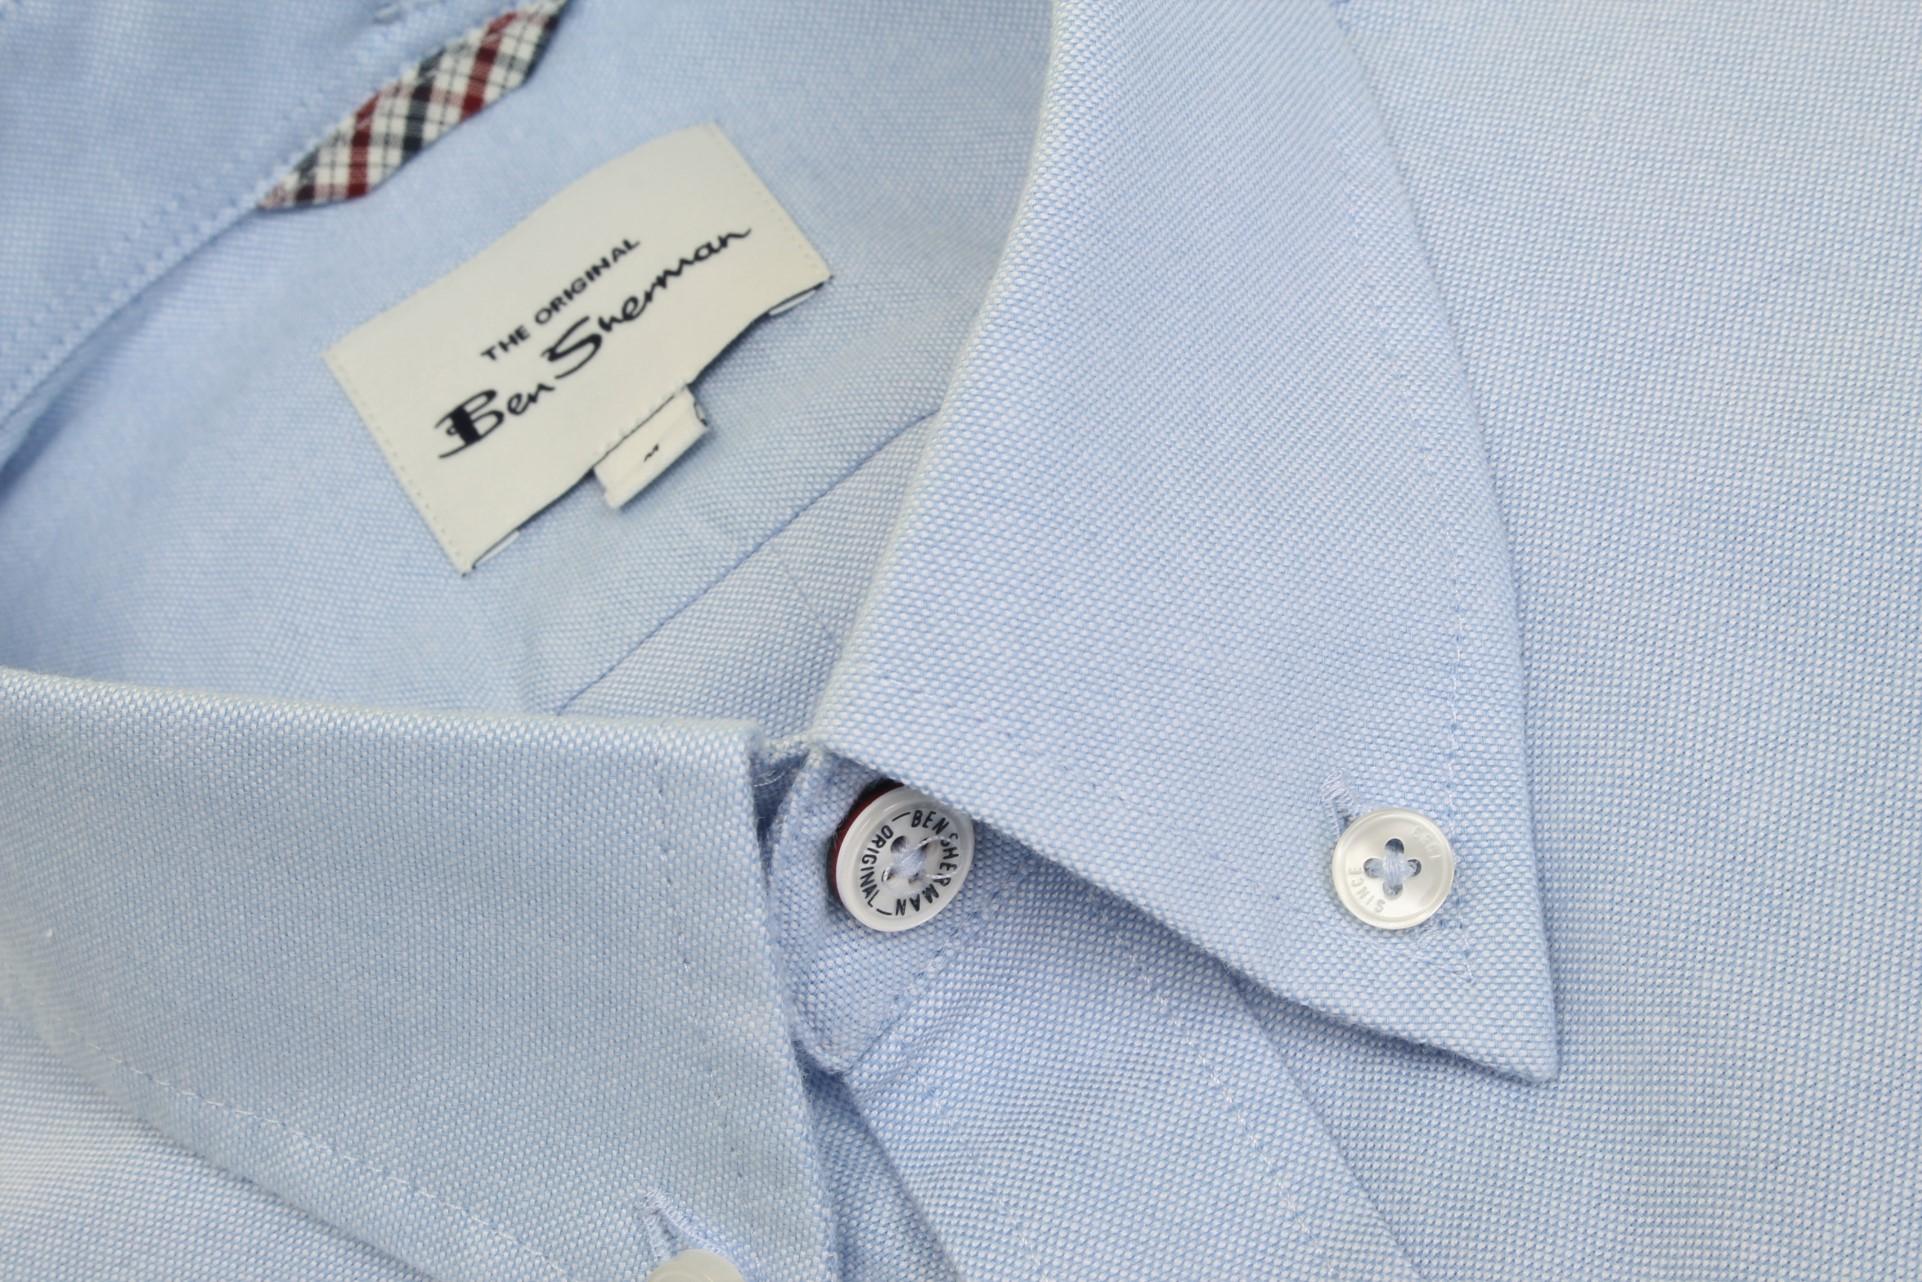 Mens-Oxford-Shirt-by-Ben-Sherman-Long-Sleeved thumbnail 35